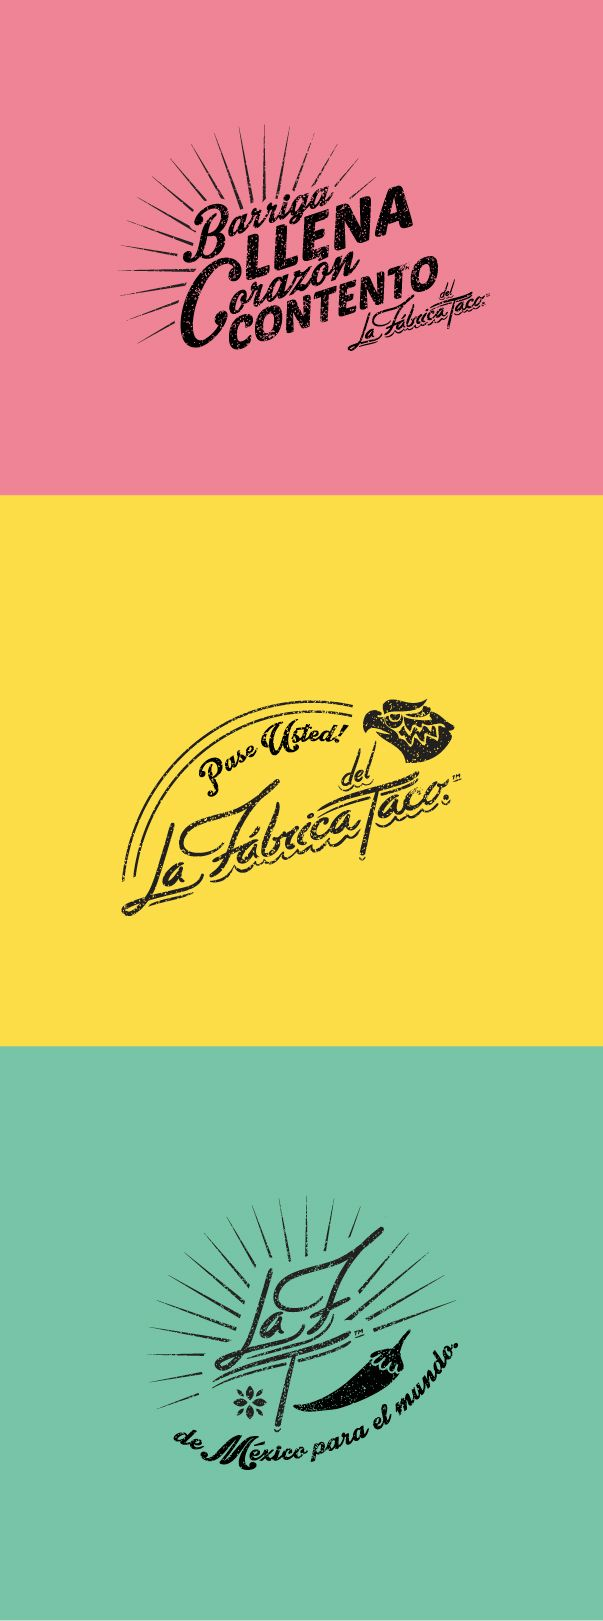 La Fábrica del Taco on Behance